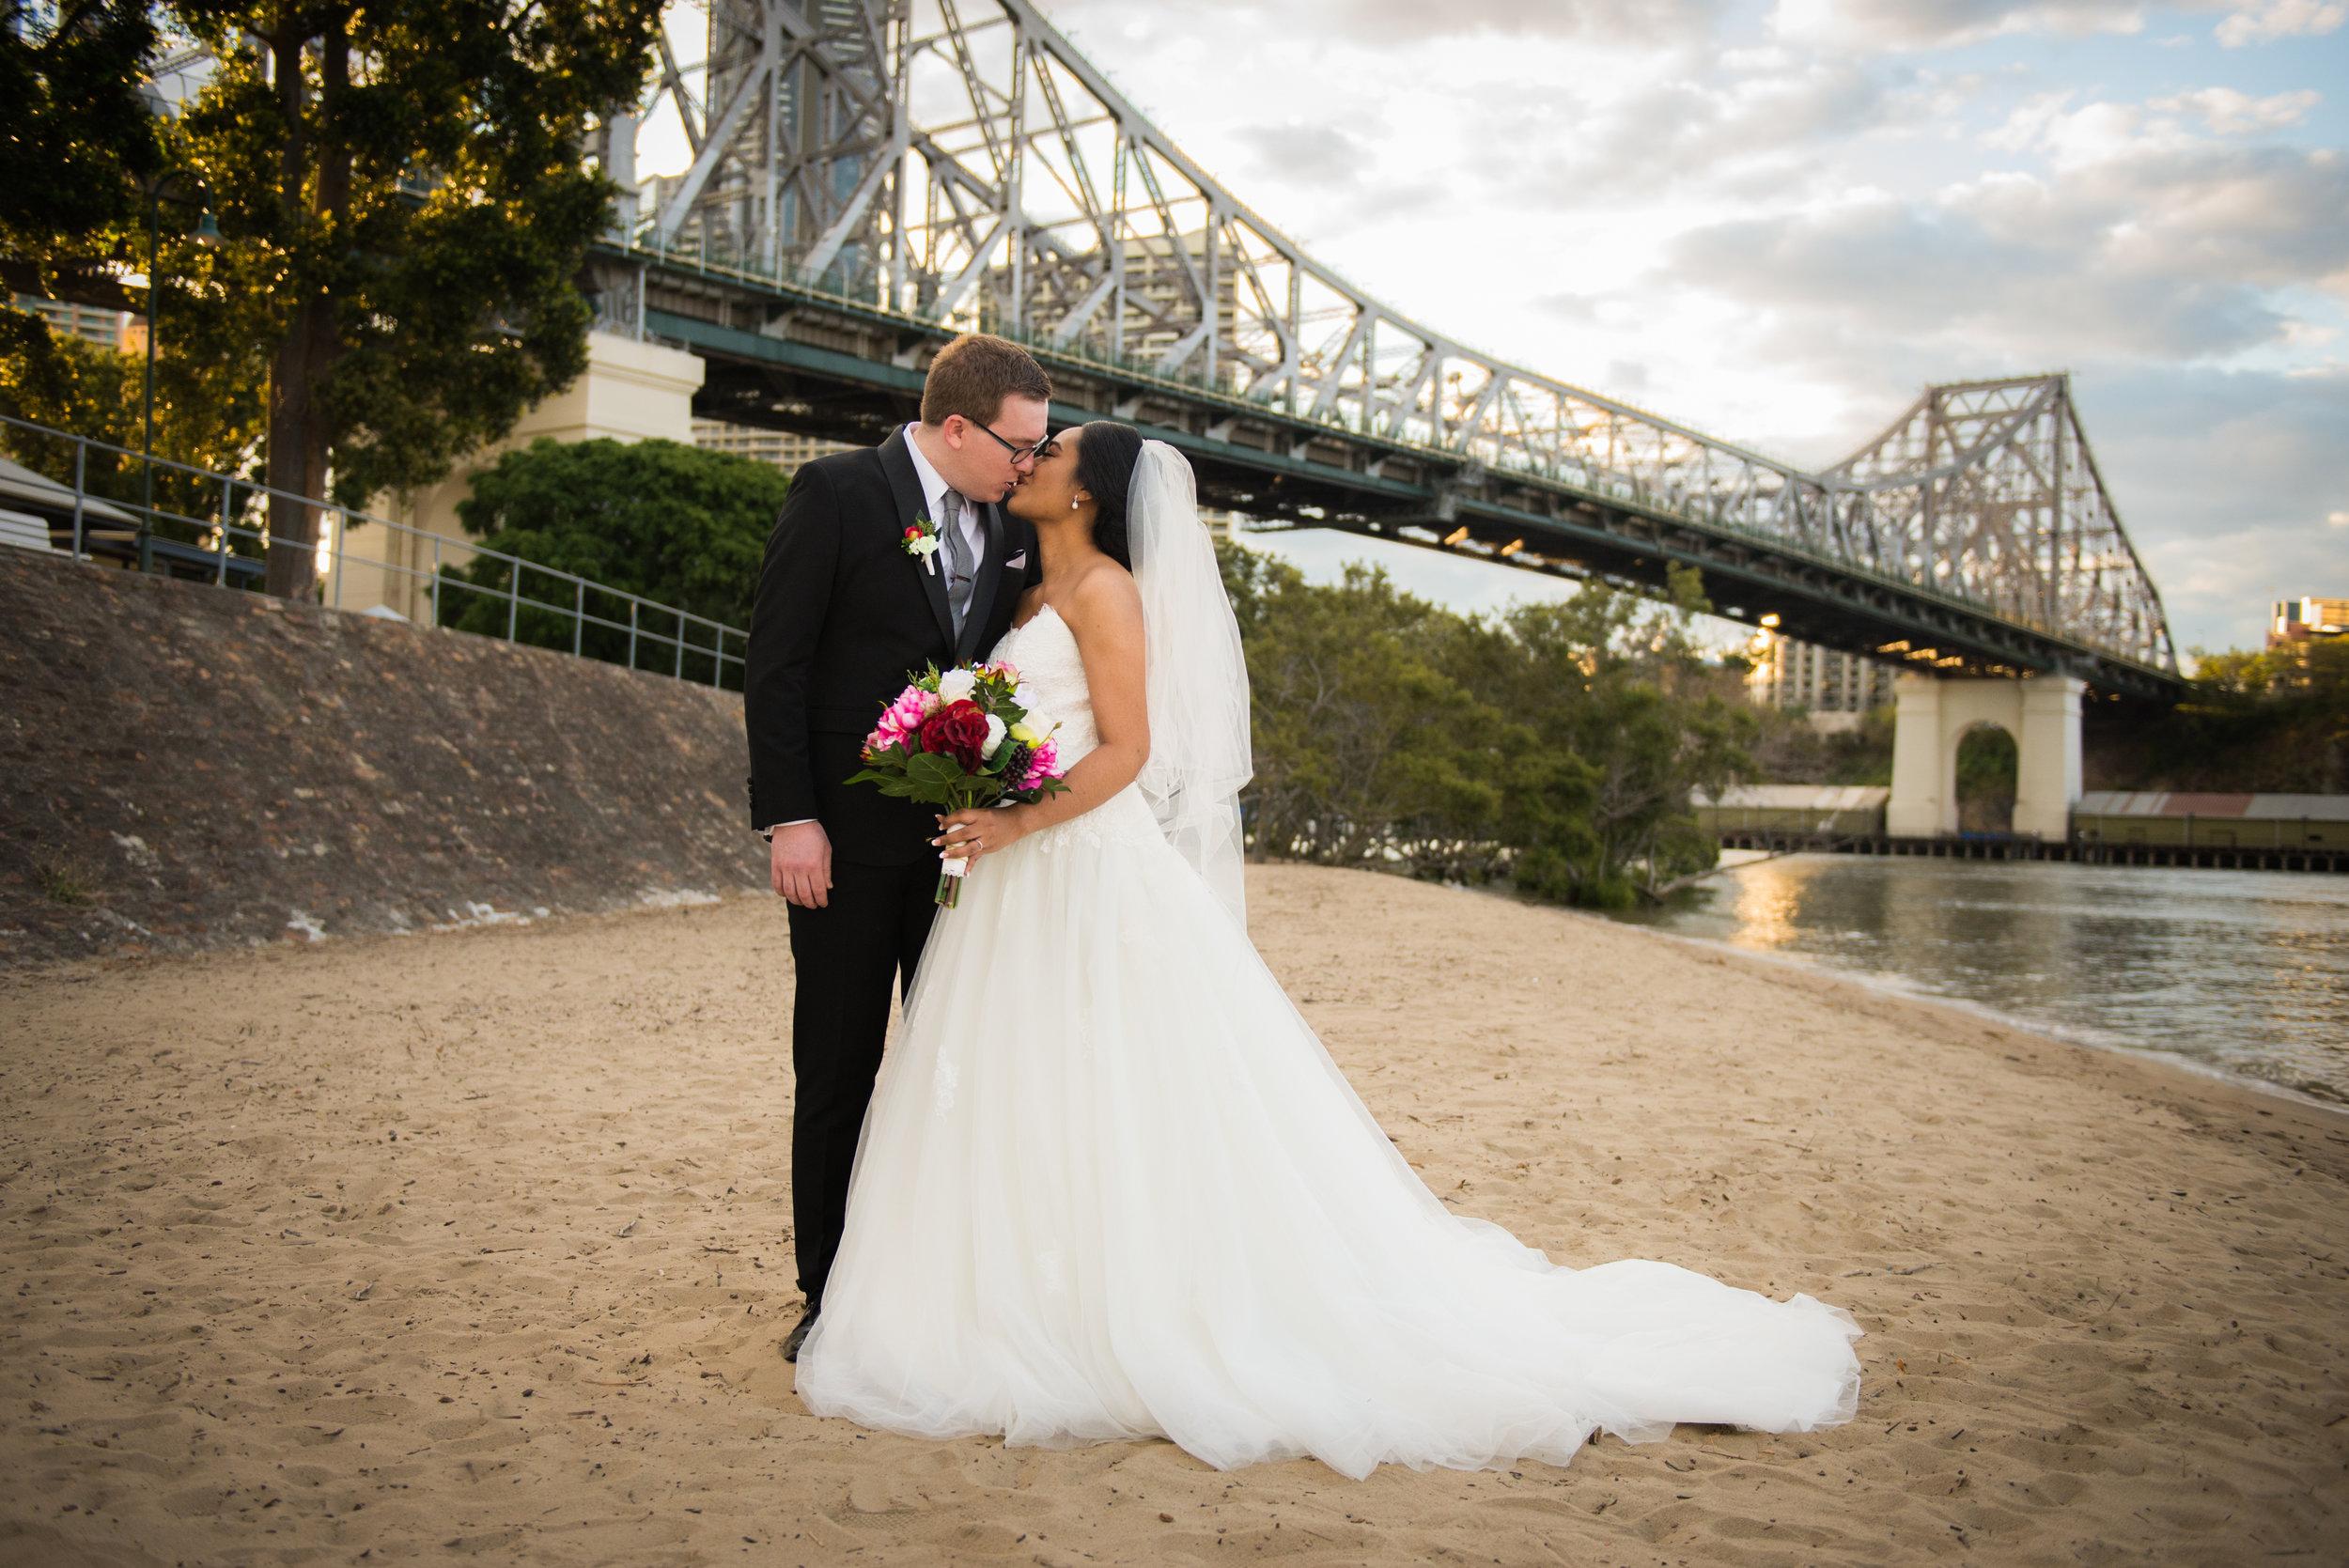 Rohan James Photography - Sophia & Dan Wedding Party & Portraits-35.jpg